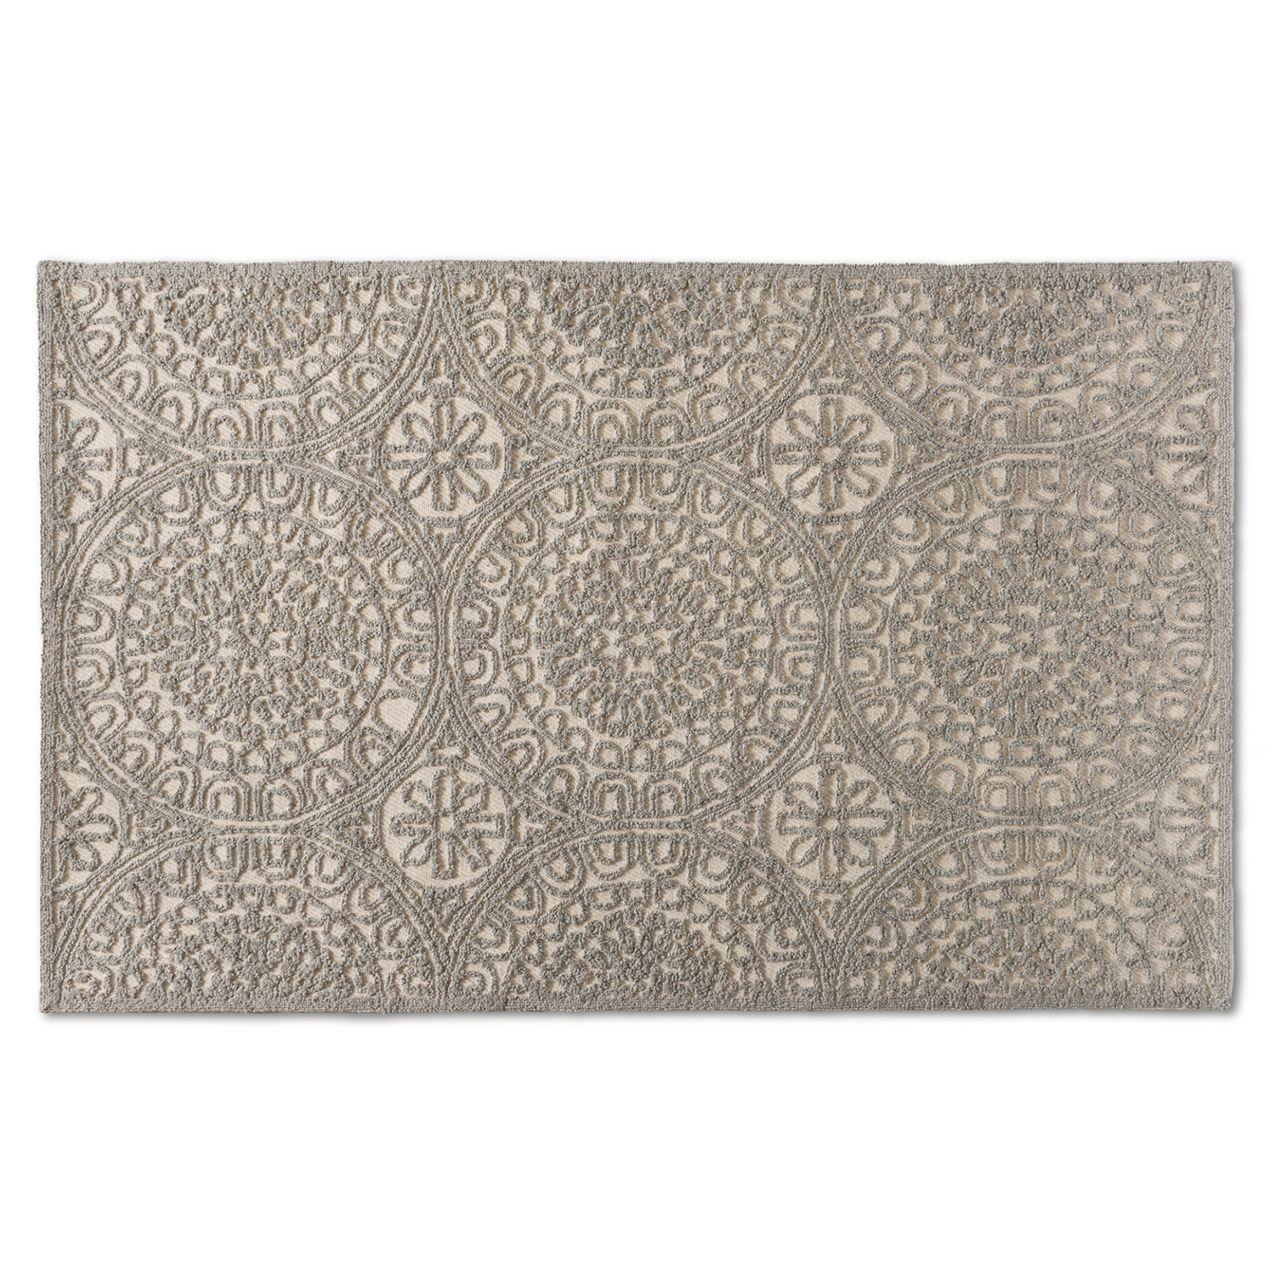 Baxton Studio Borneo Grey Hand-Tufted Wool Area Rug